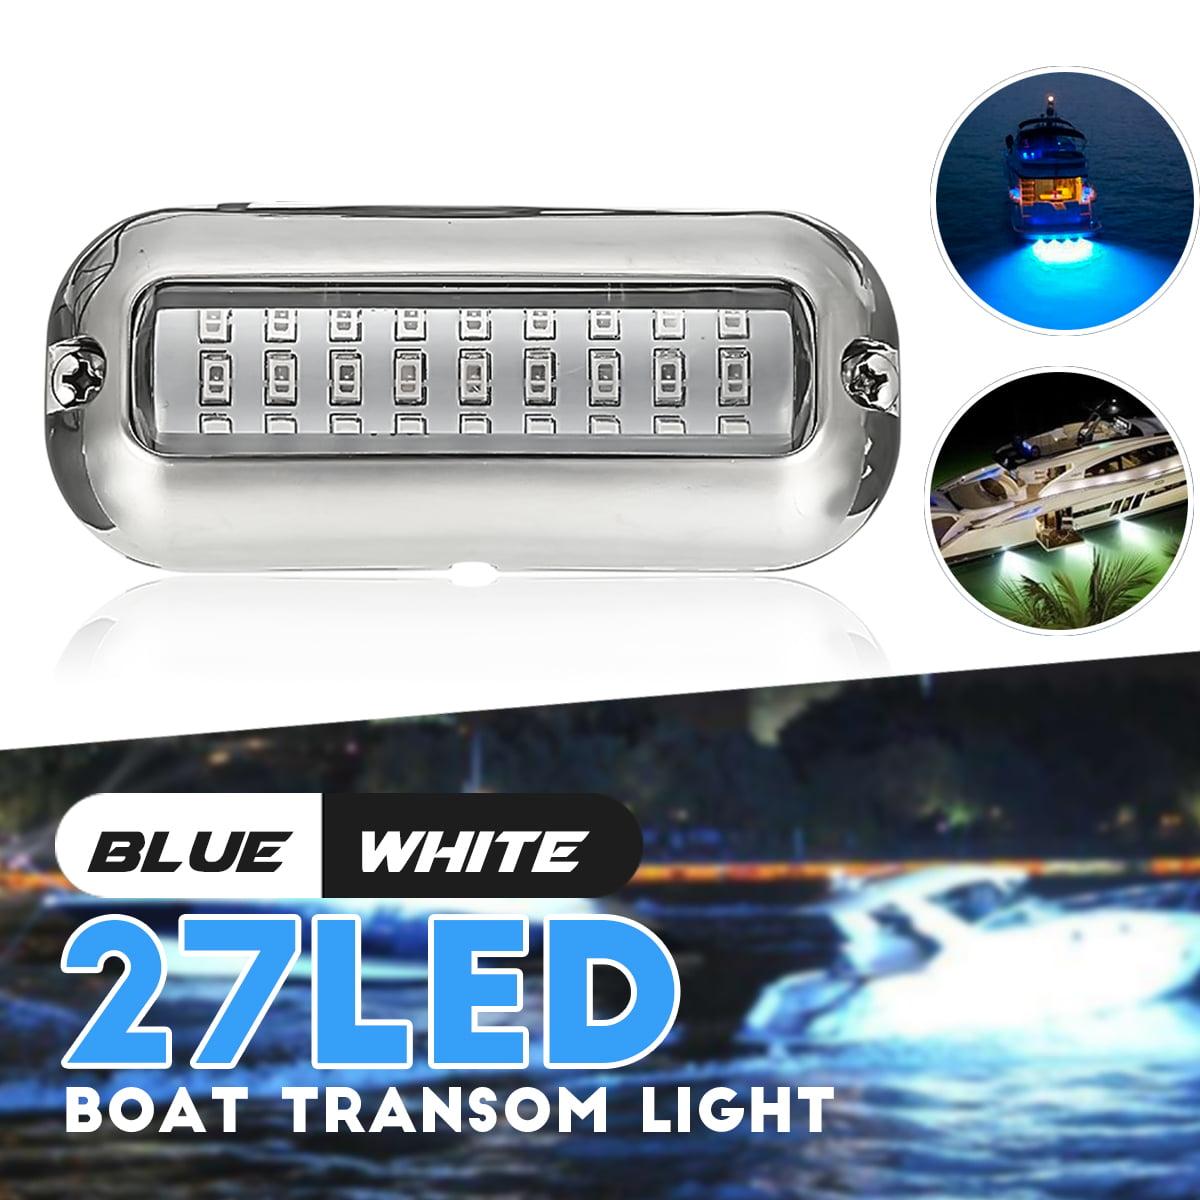 Marine/Boat 27 Blue LED 50W  Underwater Pontoon Boat Transom Lights Stainless Steel